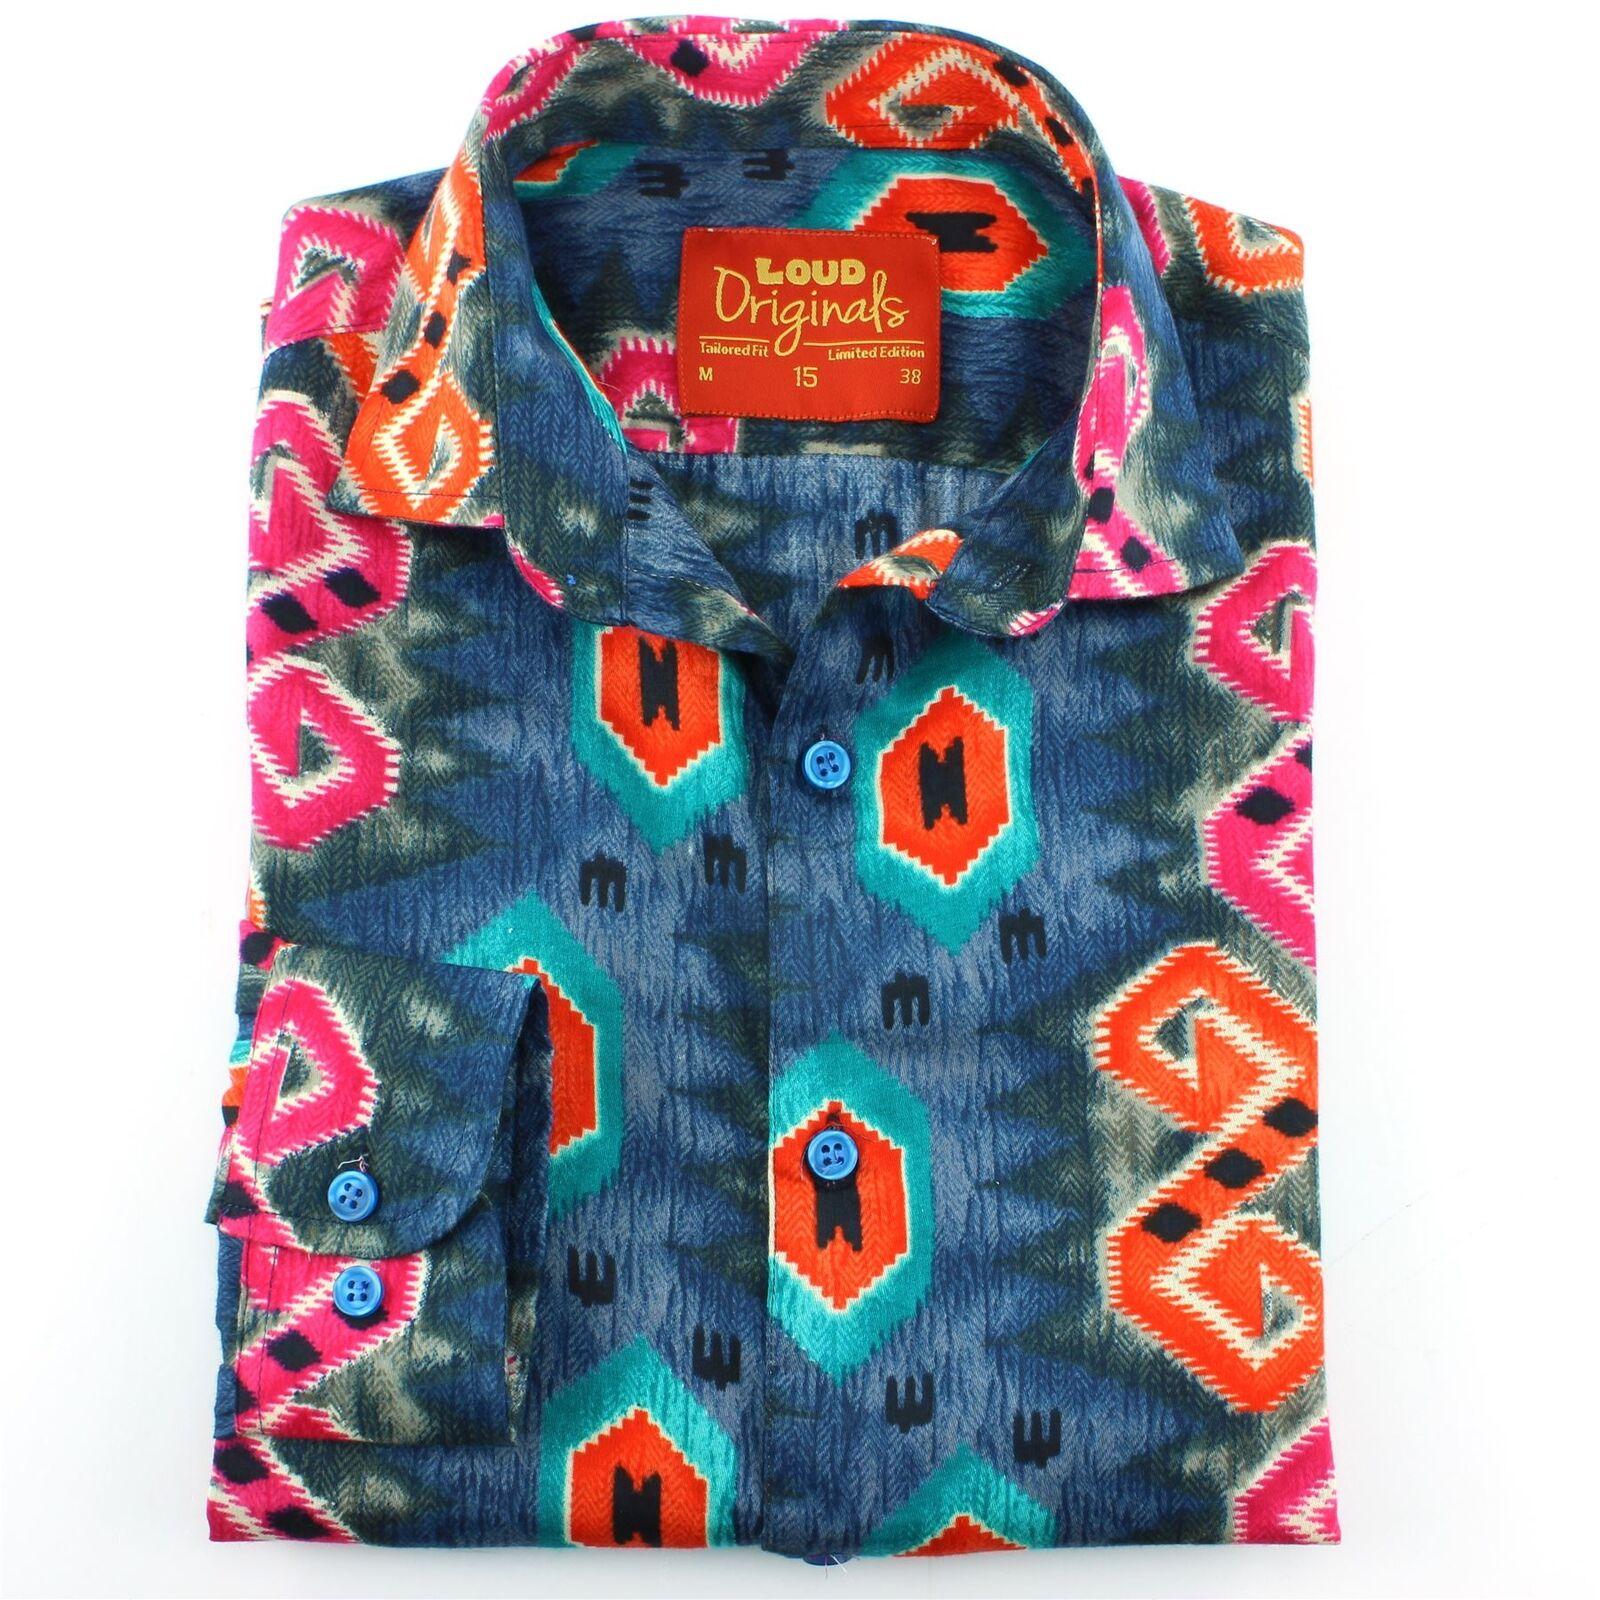 Camicia da uomo Loud Originals Slim a a a spina di pesce blu rétro psichedelico 770c67